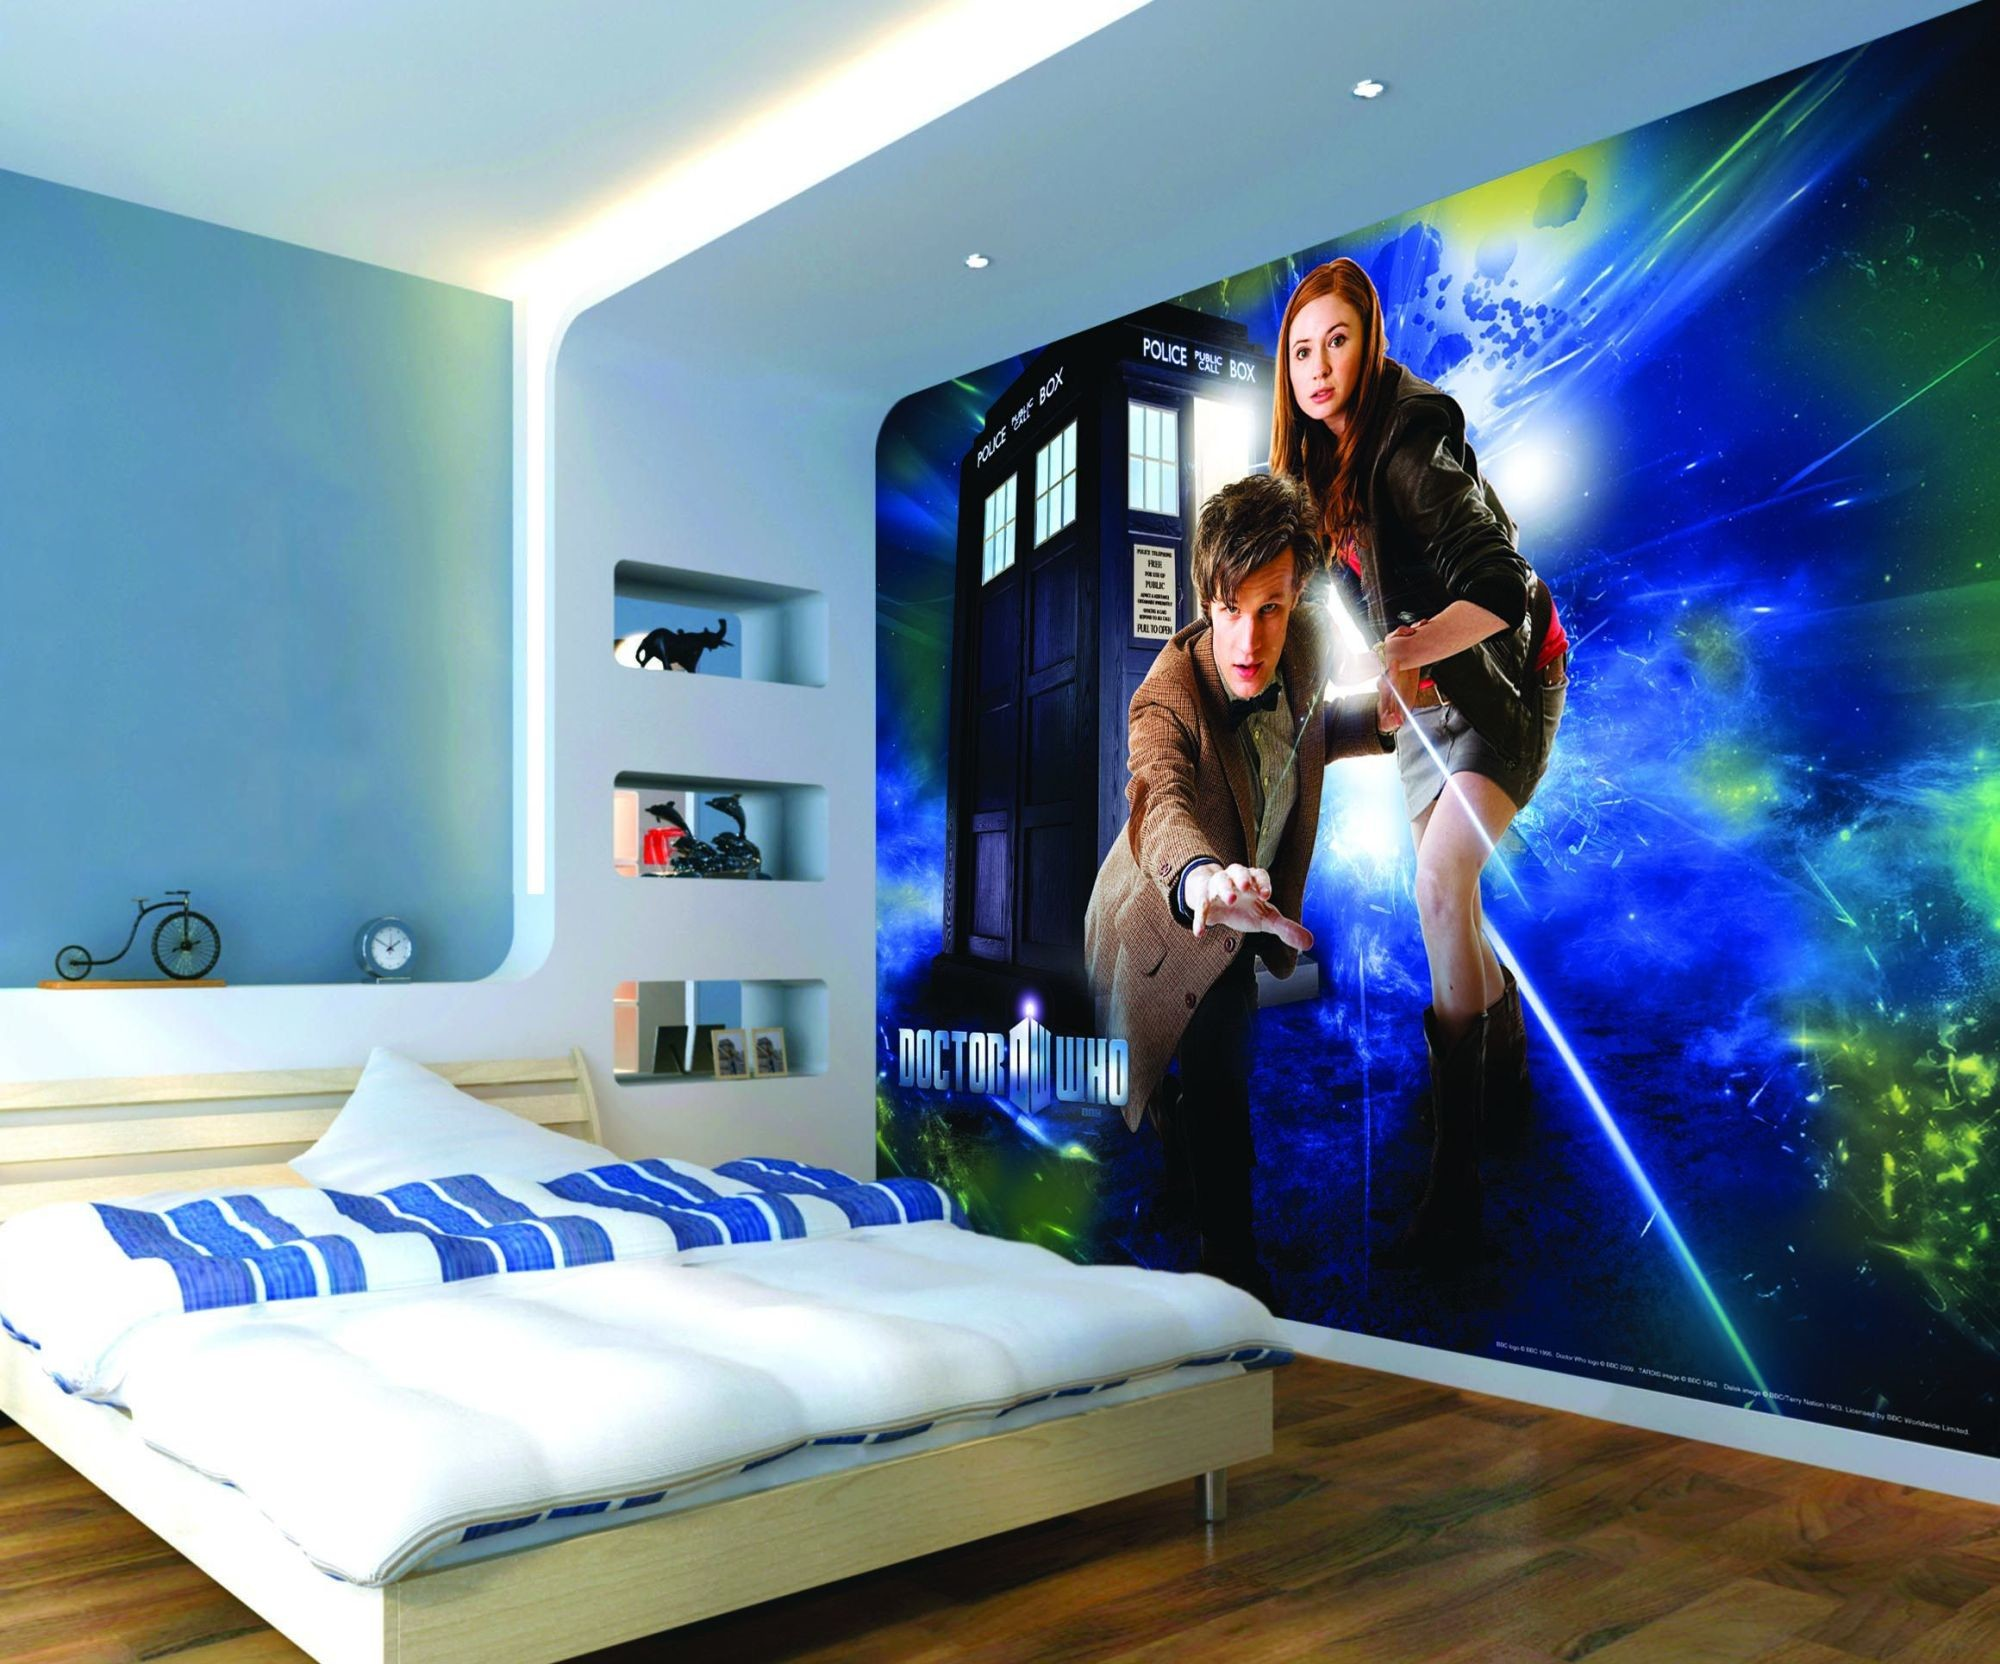 good looking doctor who bedroom wallpaper. 2000x1664 Explore Doctor Who Bedroom Wallpaper Muralore Main Image Ems  Pinterest Tardis Room 37 images